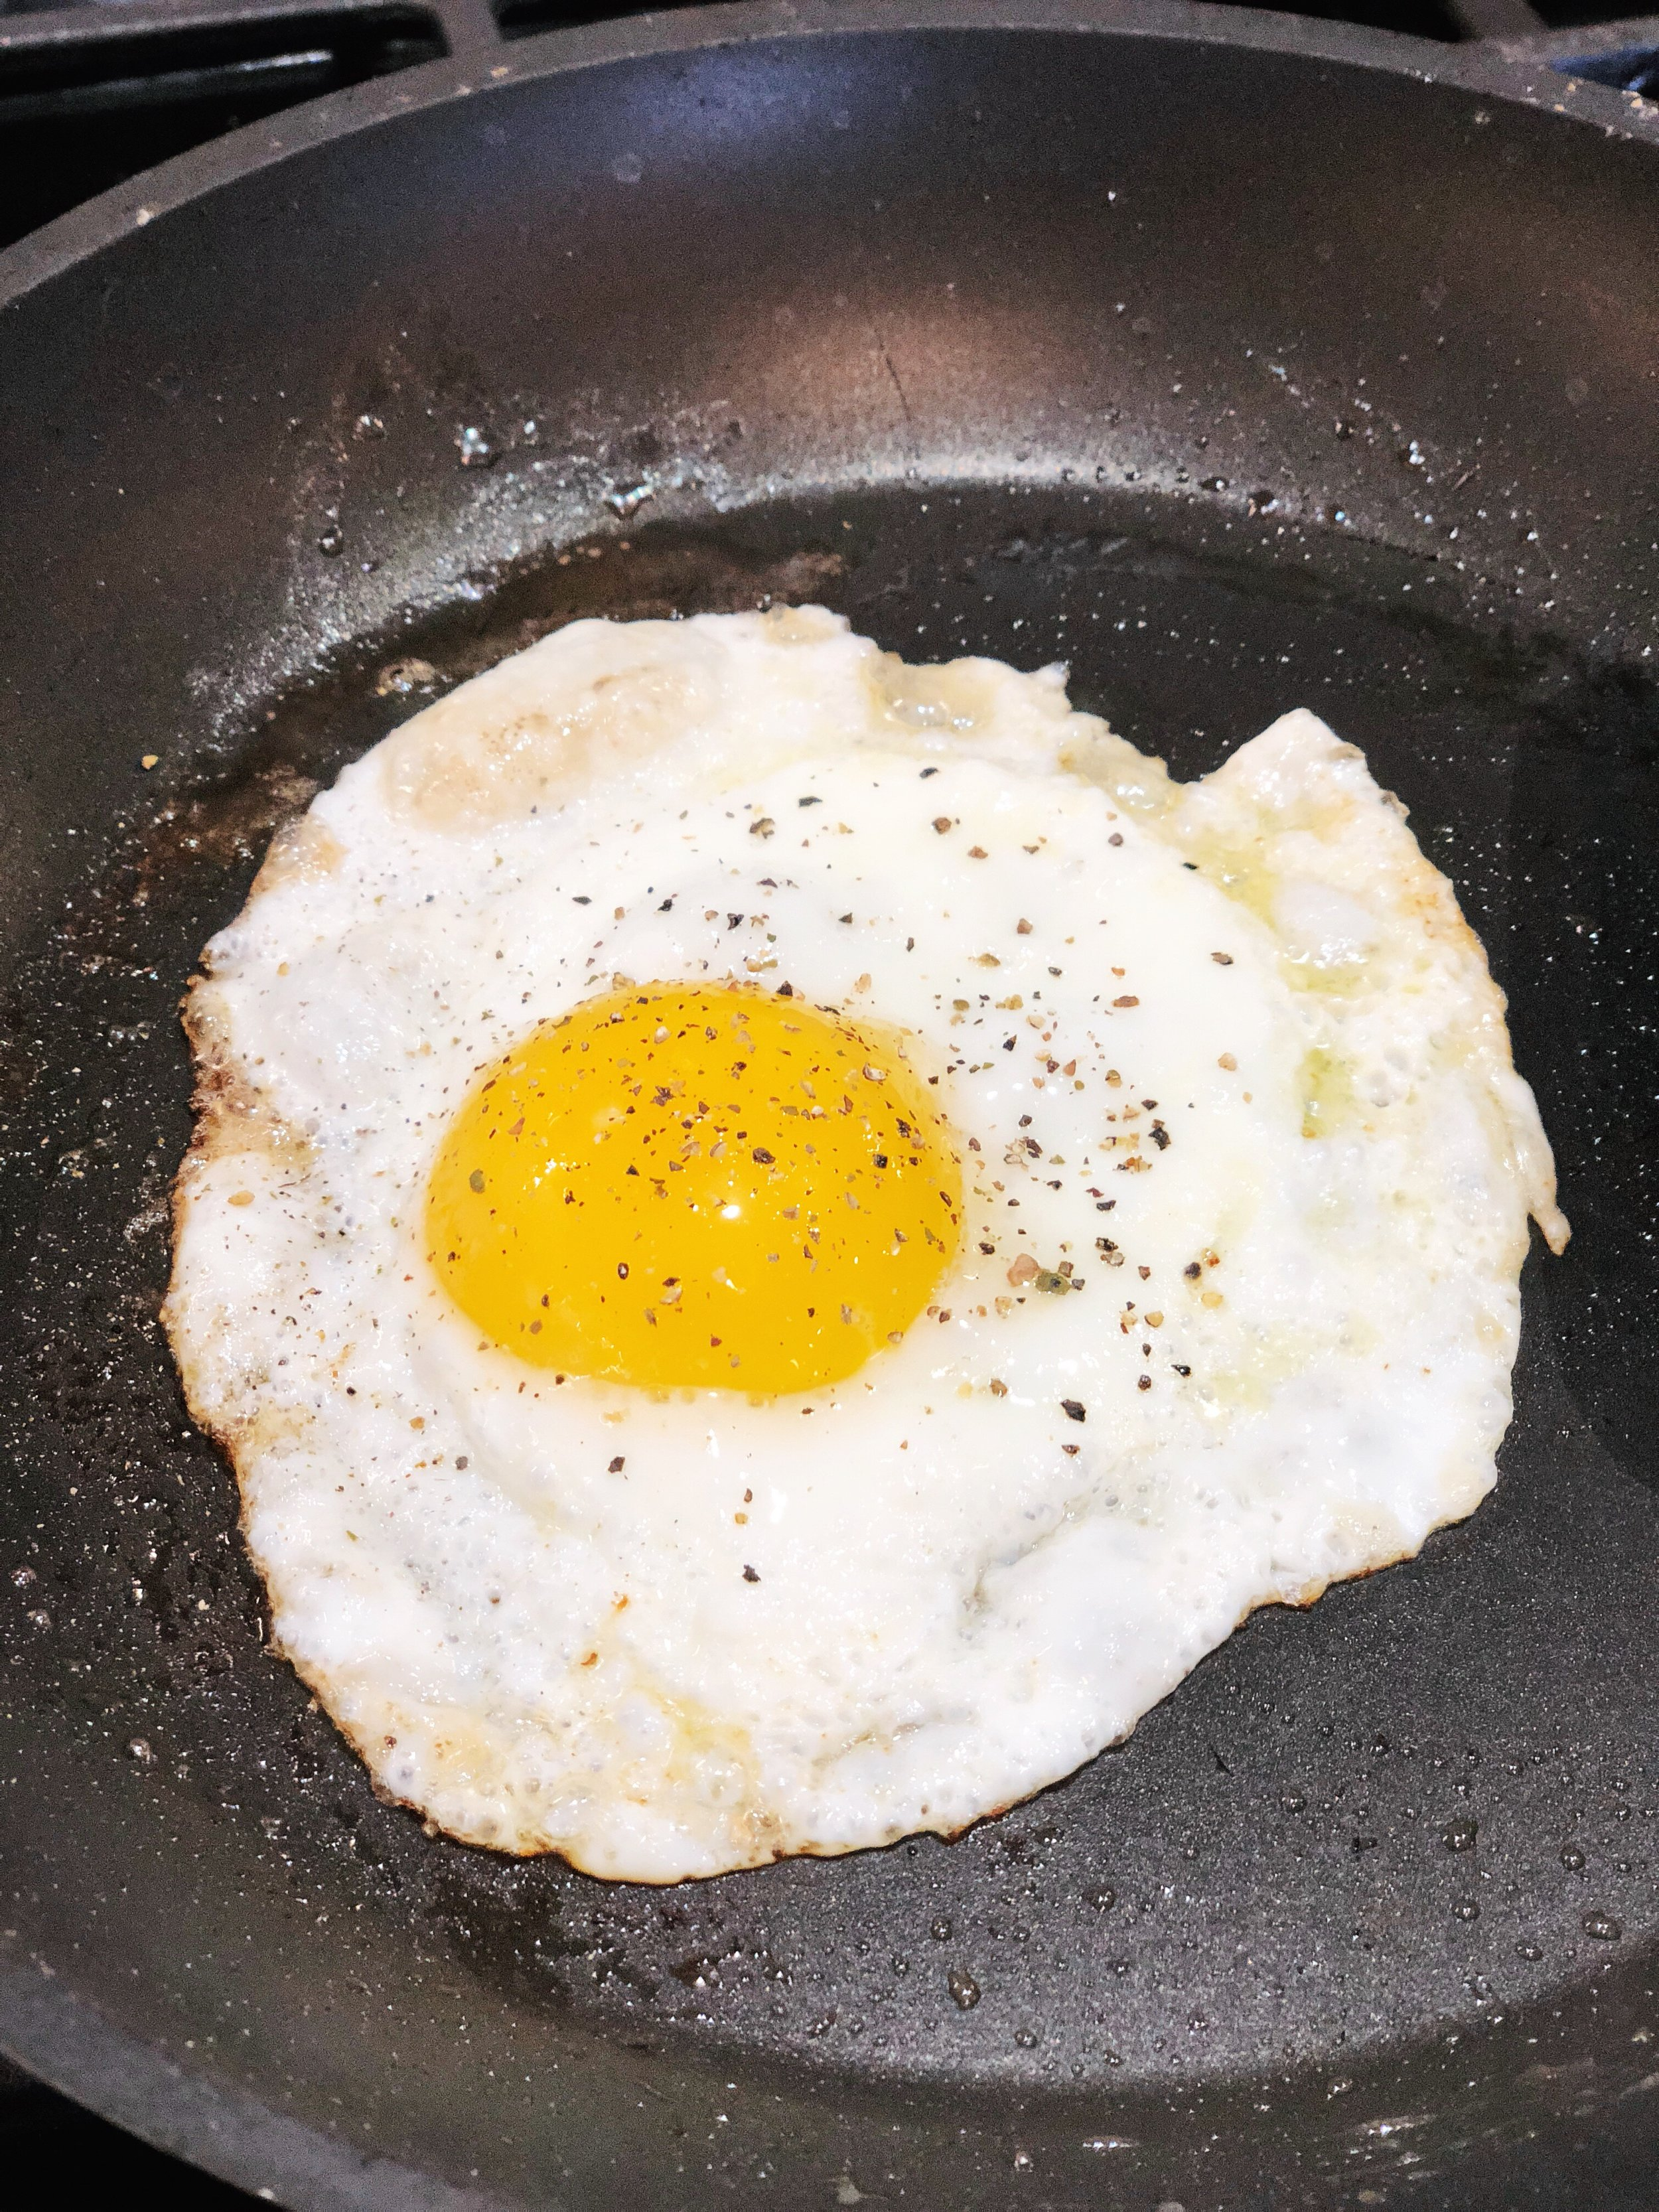 almonds and asana fried egg.jpg